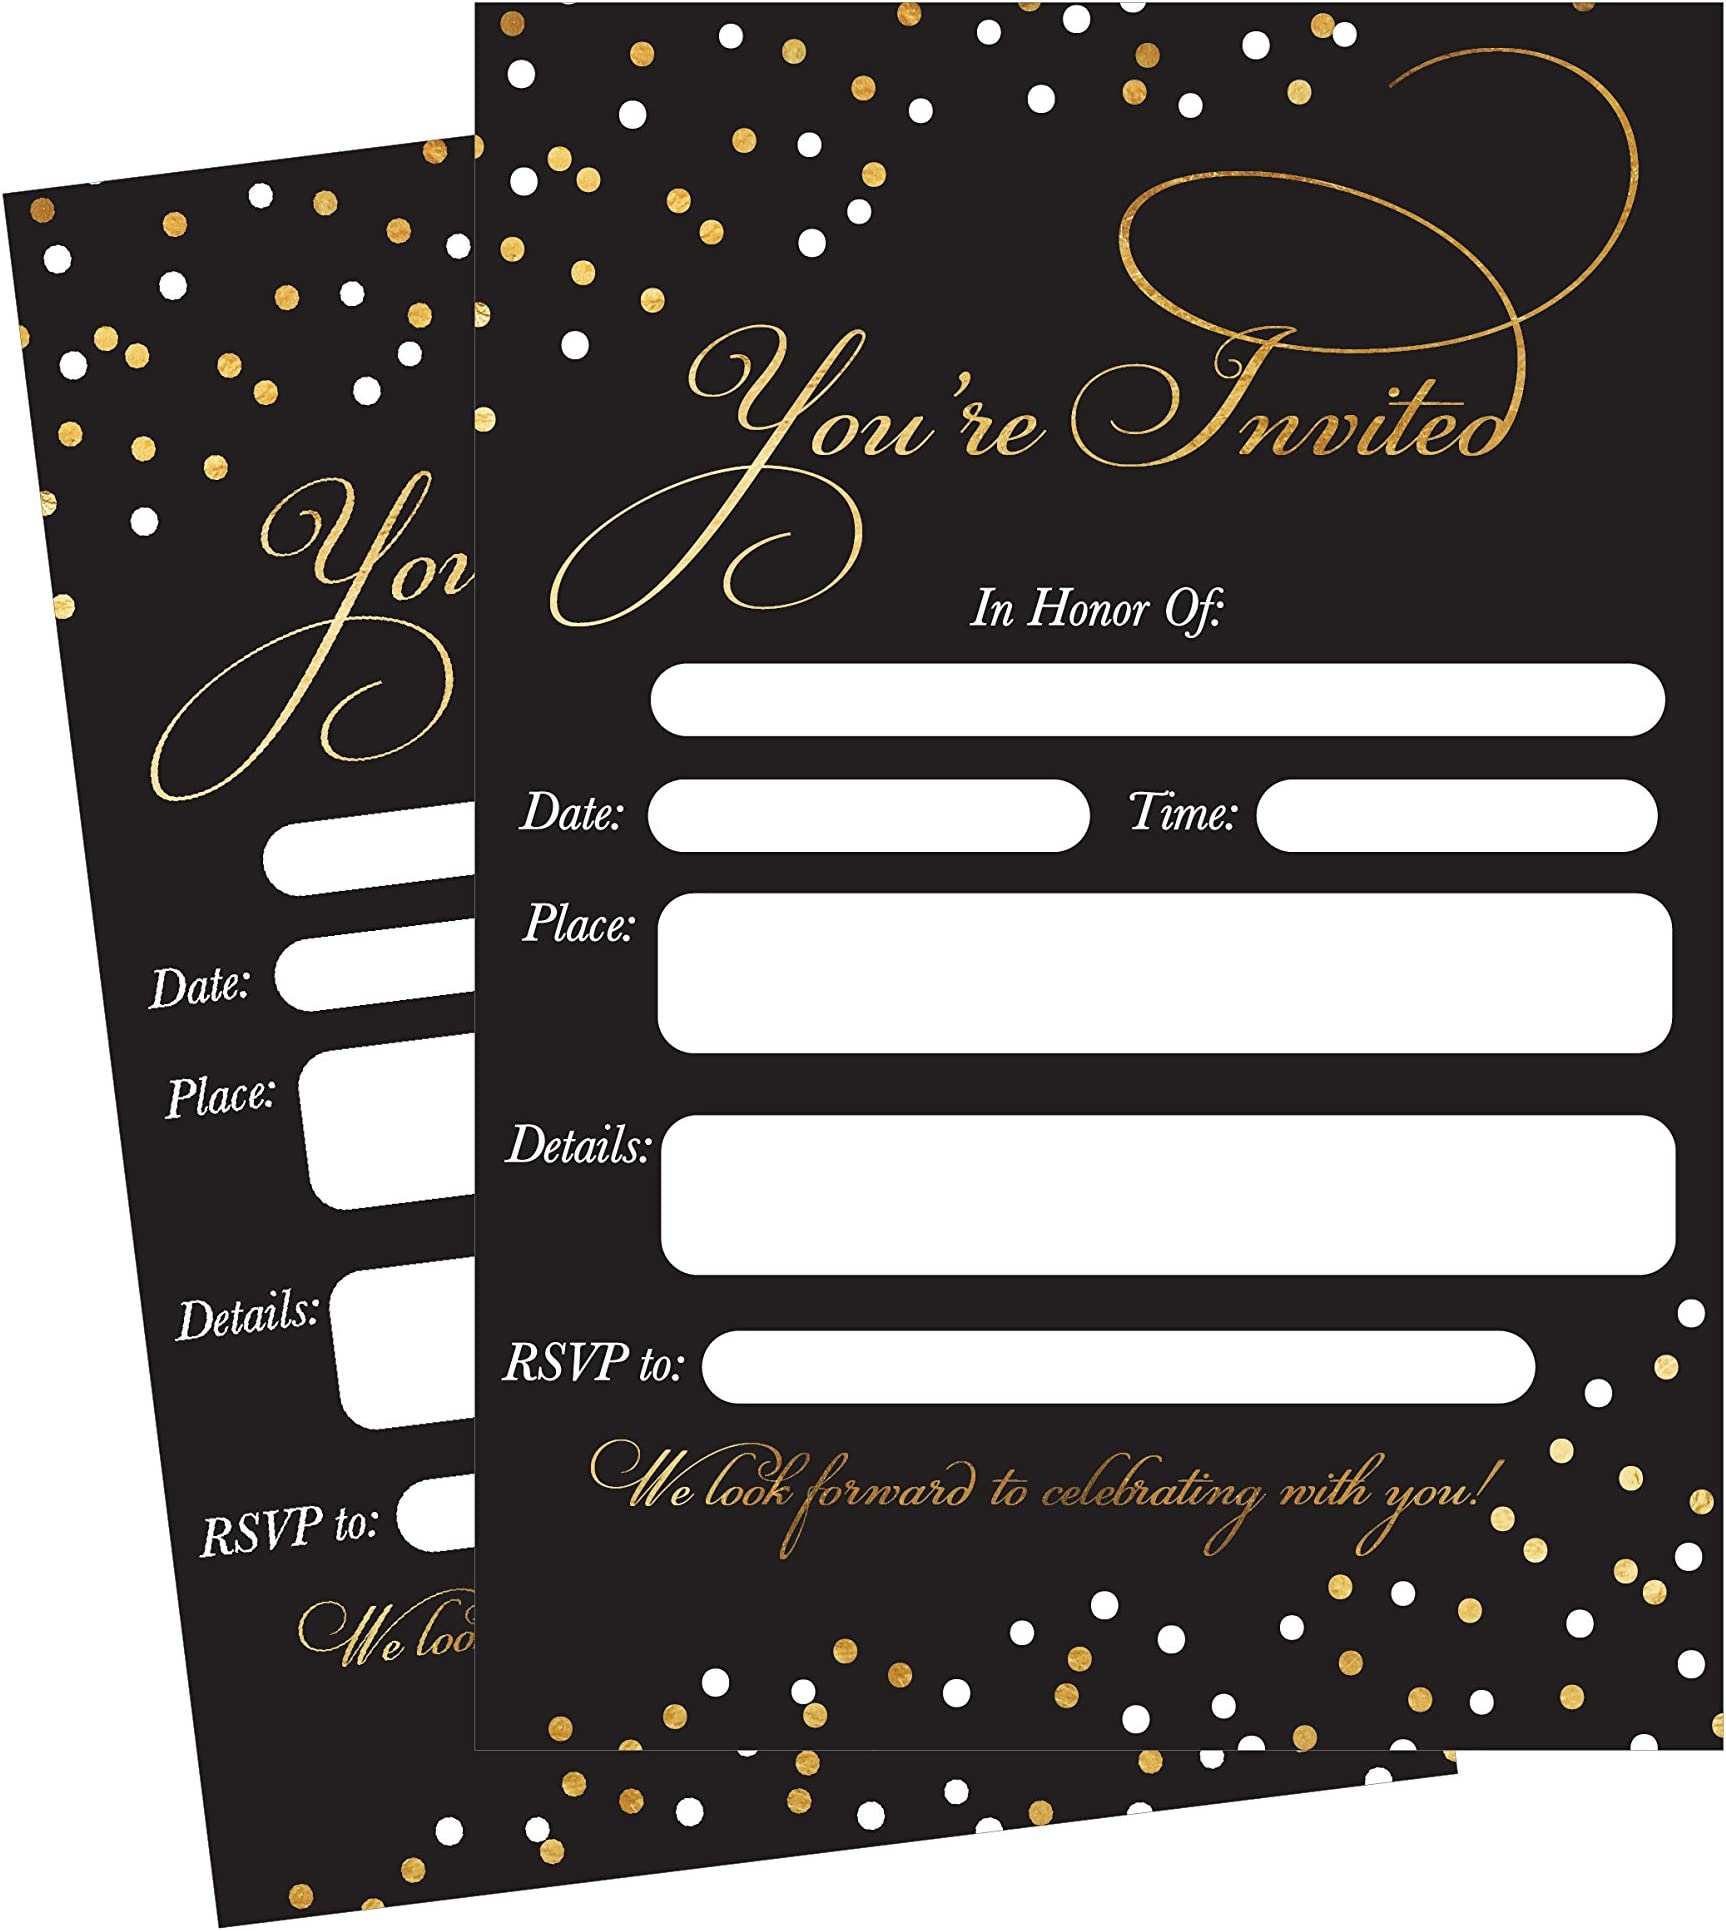 Engagement Invitations birthday Invitations Wedding Invitations Printed invitations Baby Shower Invitations 4x6 Printed Invitations